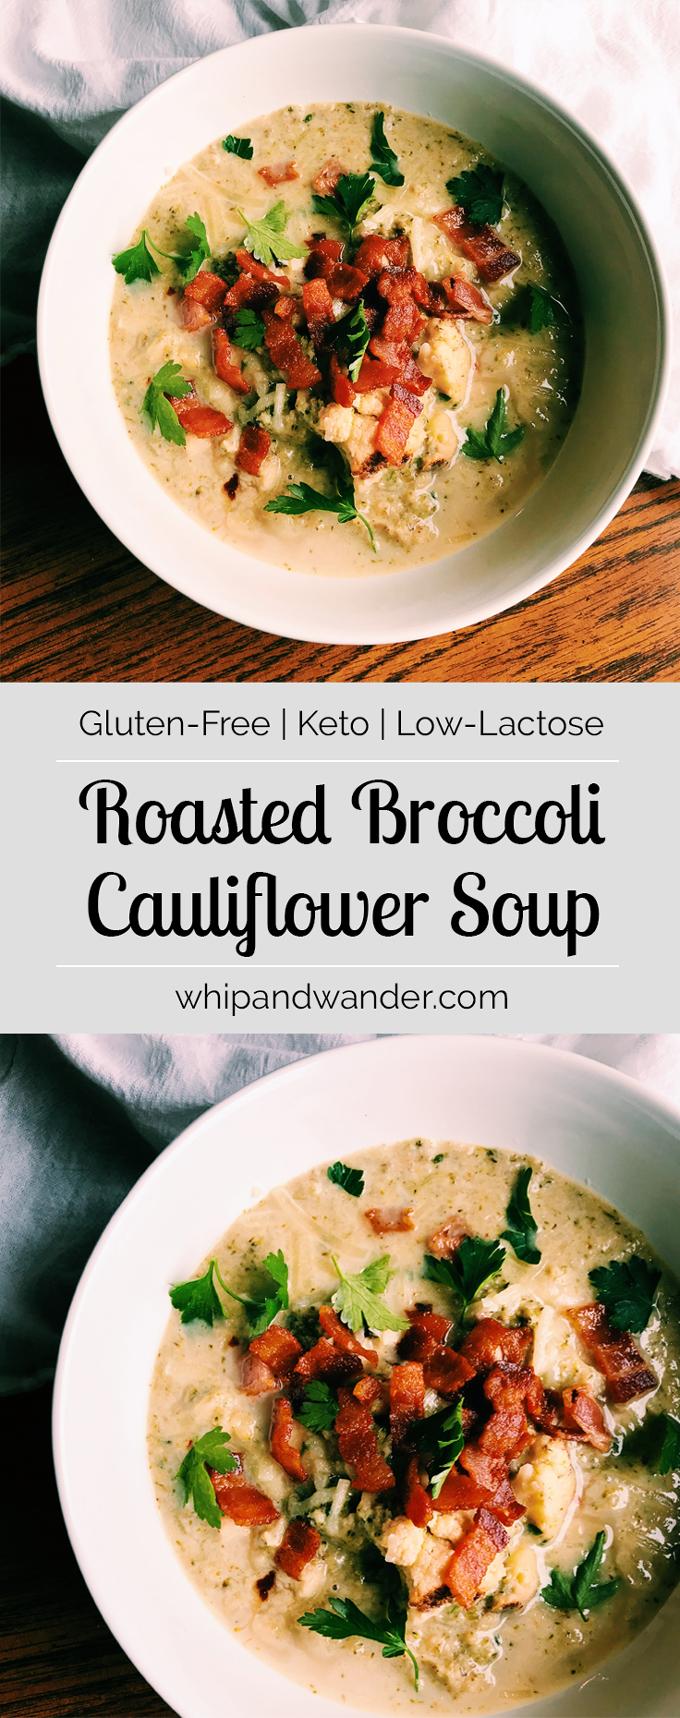 Roasted Broccoli Cauliflower Soup